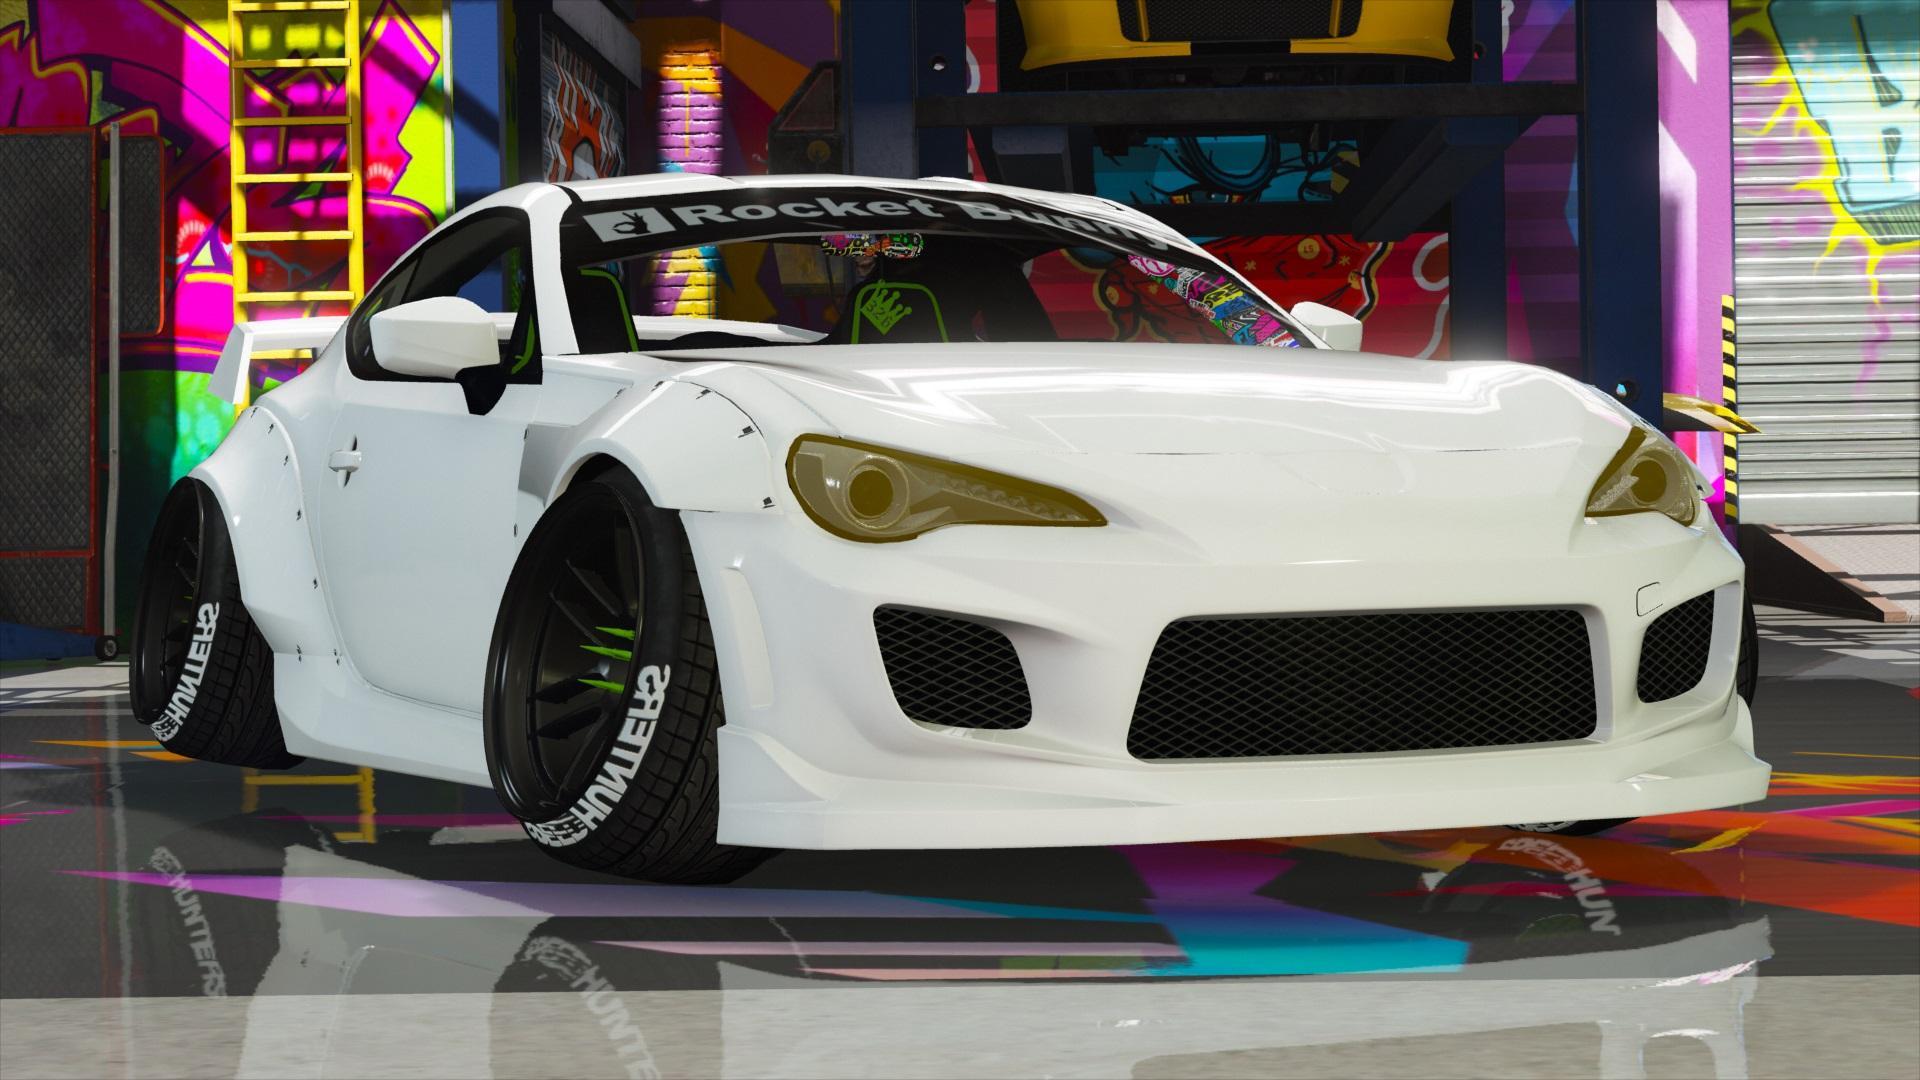 Gta 5 Cars Wallpaper Download Toyota Gt 86 Rocketbunny V2 Stanced Gta5 Mods Com